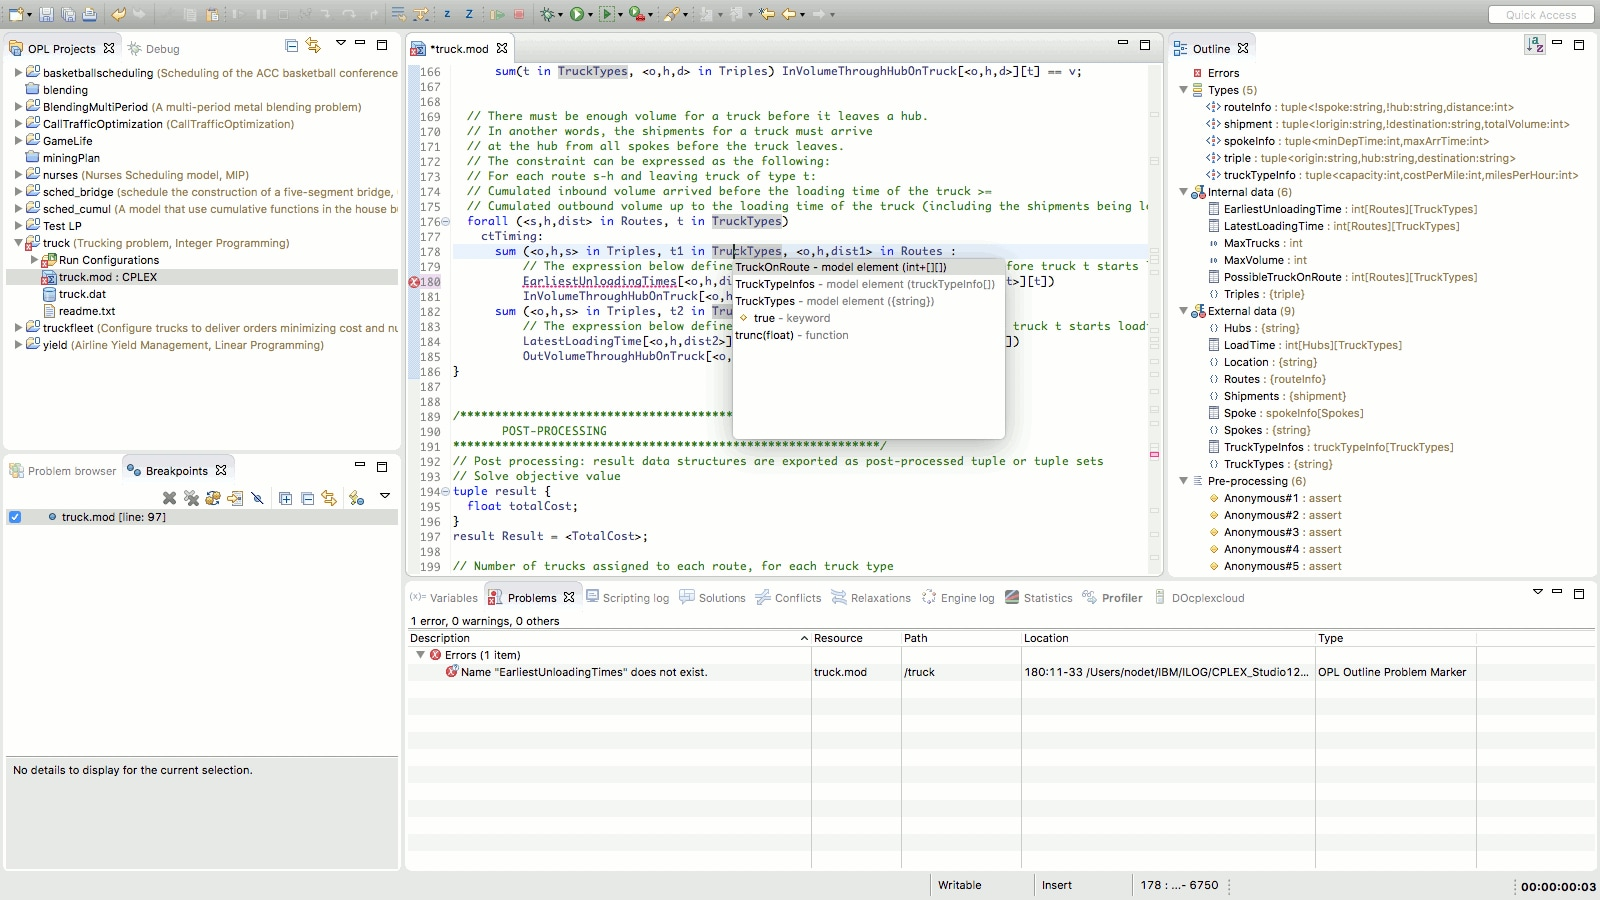 Syntax checking and auto-completion in IBM ILOG CPLEX Optimization Studio